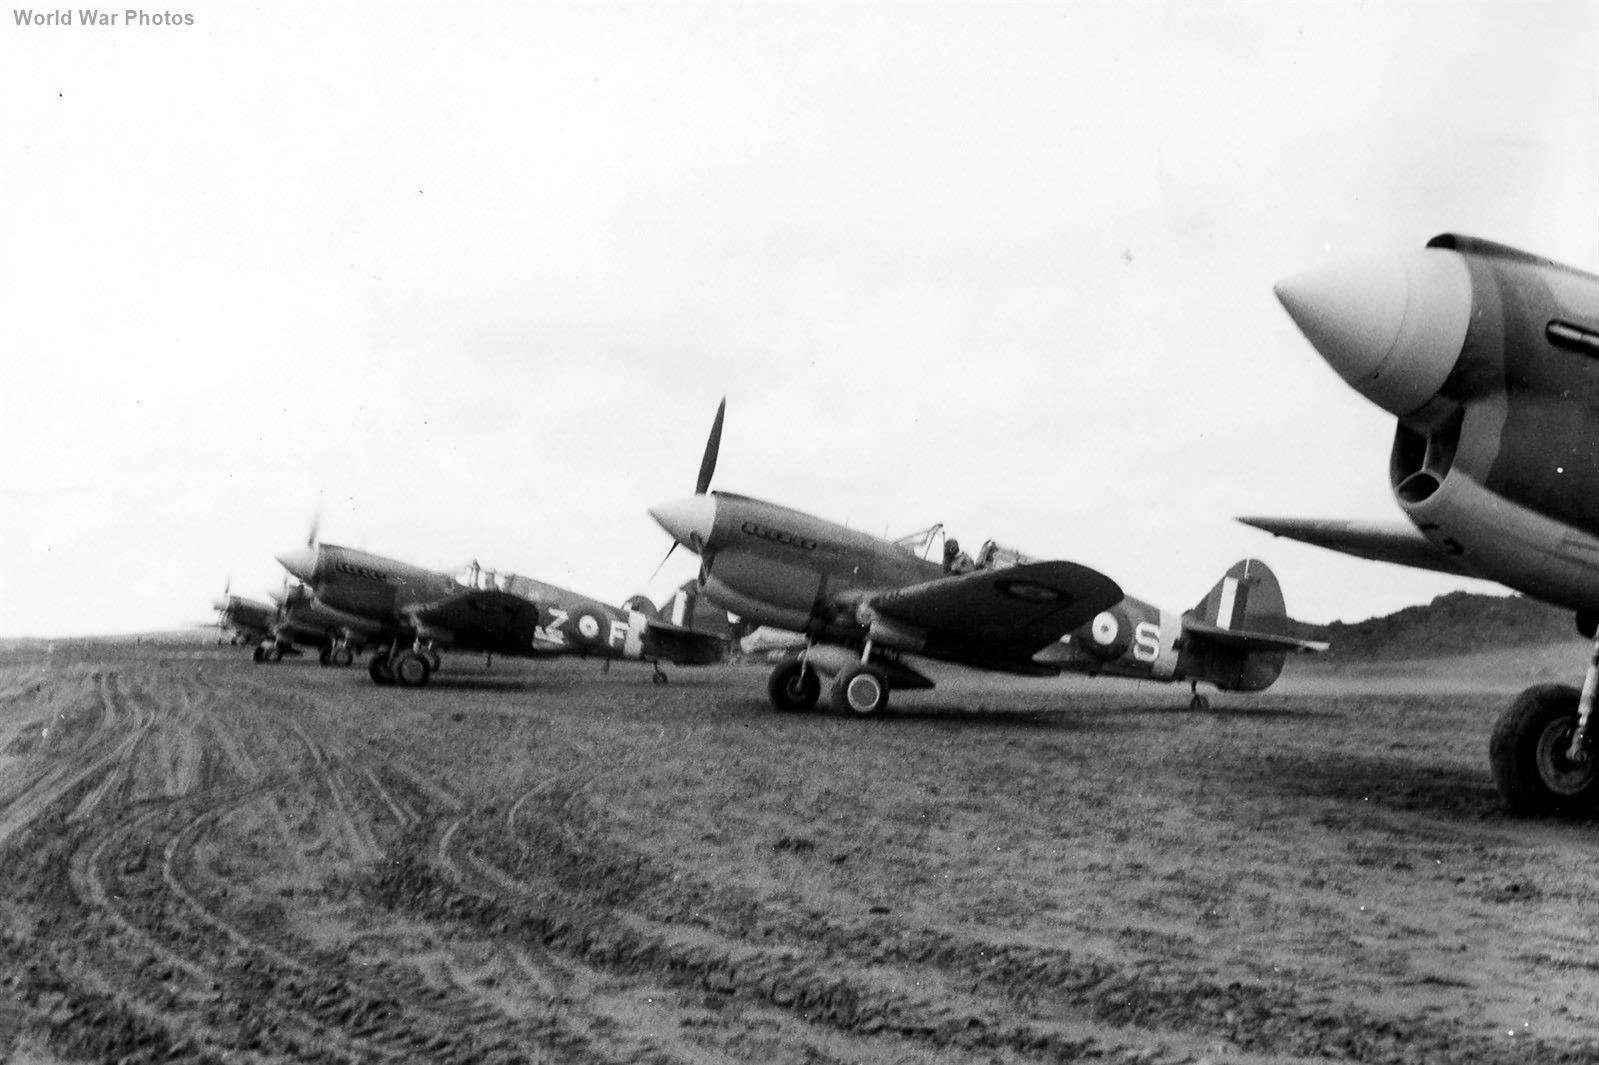 Canadian 111 Squadron Kittyhawks at Cold Bay May 1942